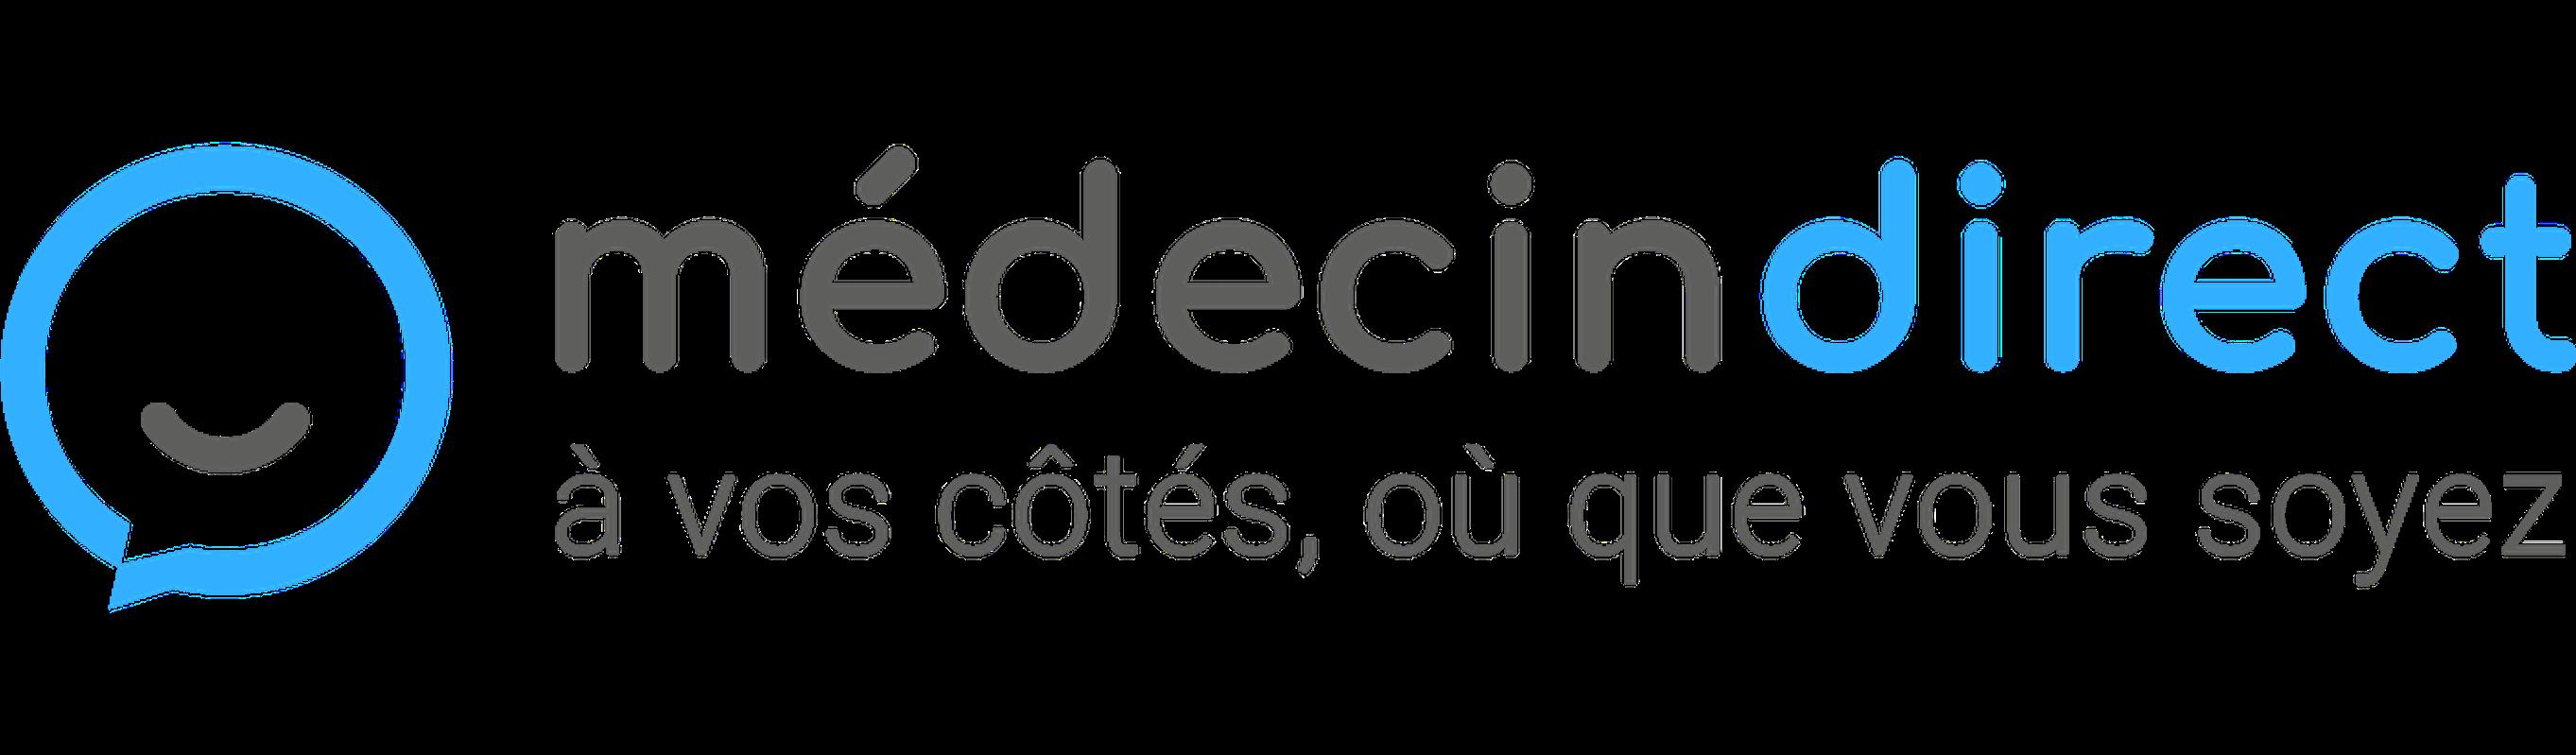 MedecinDirect-téléconsultation